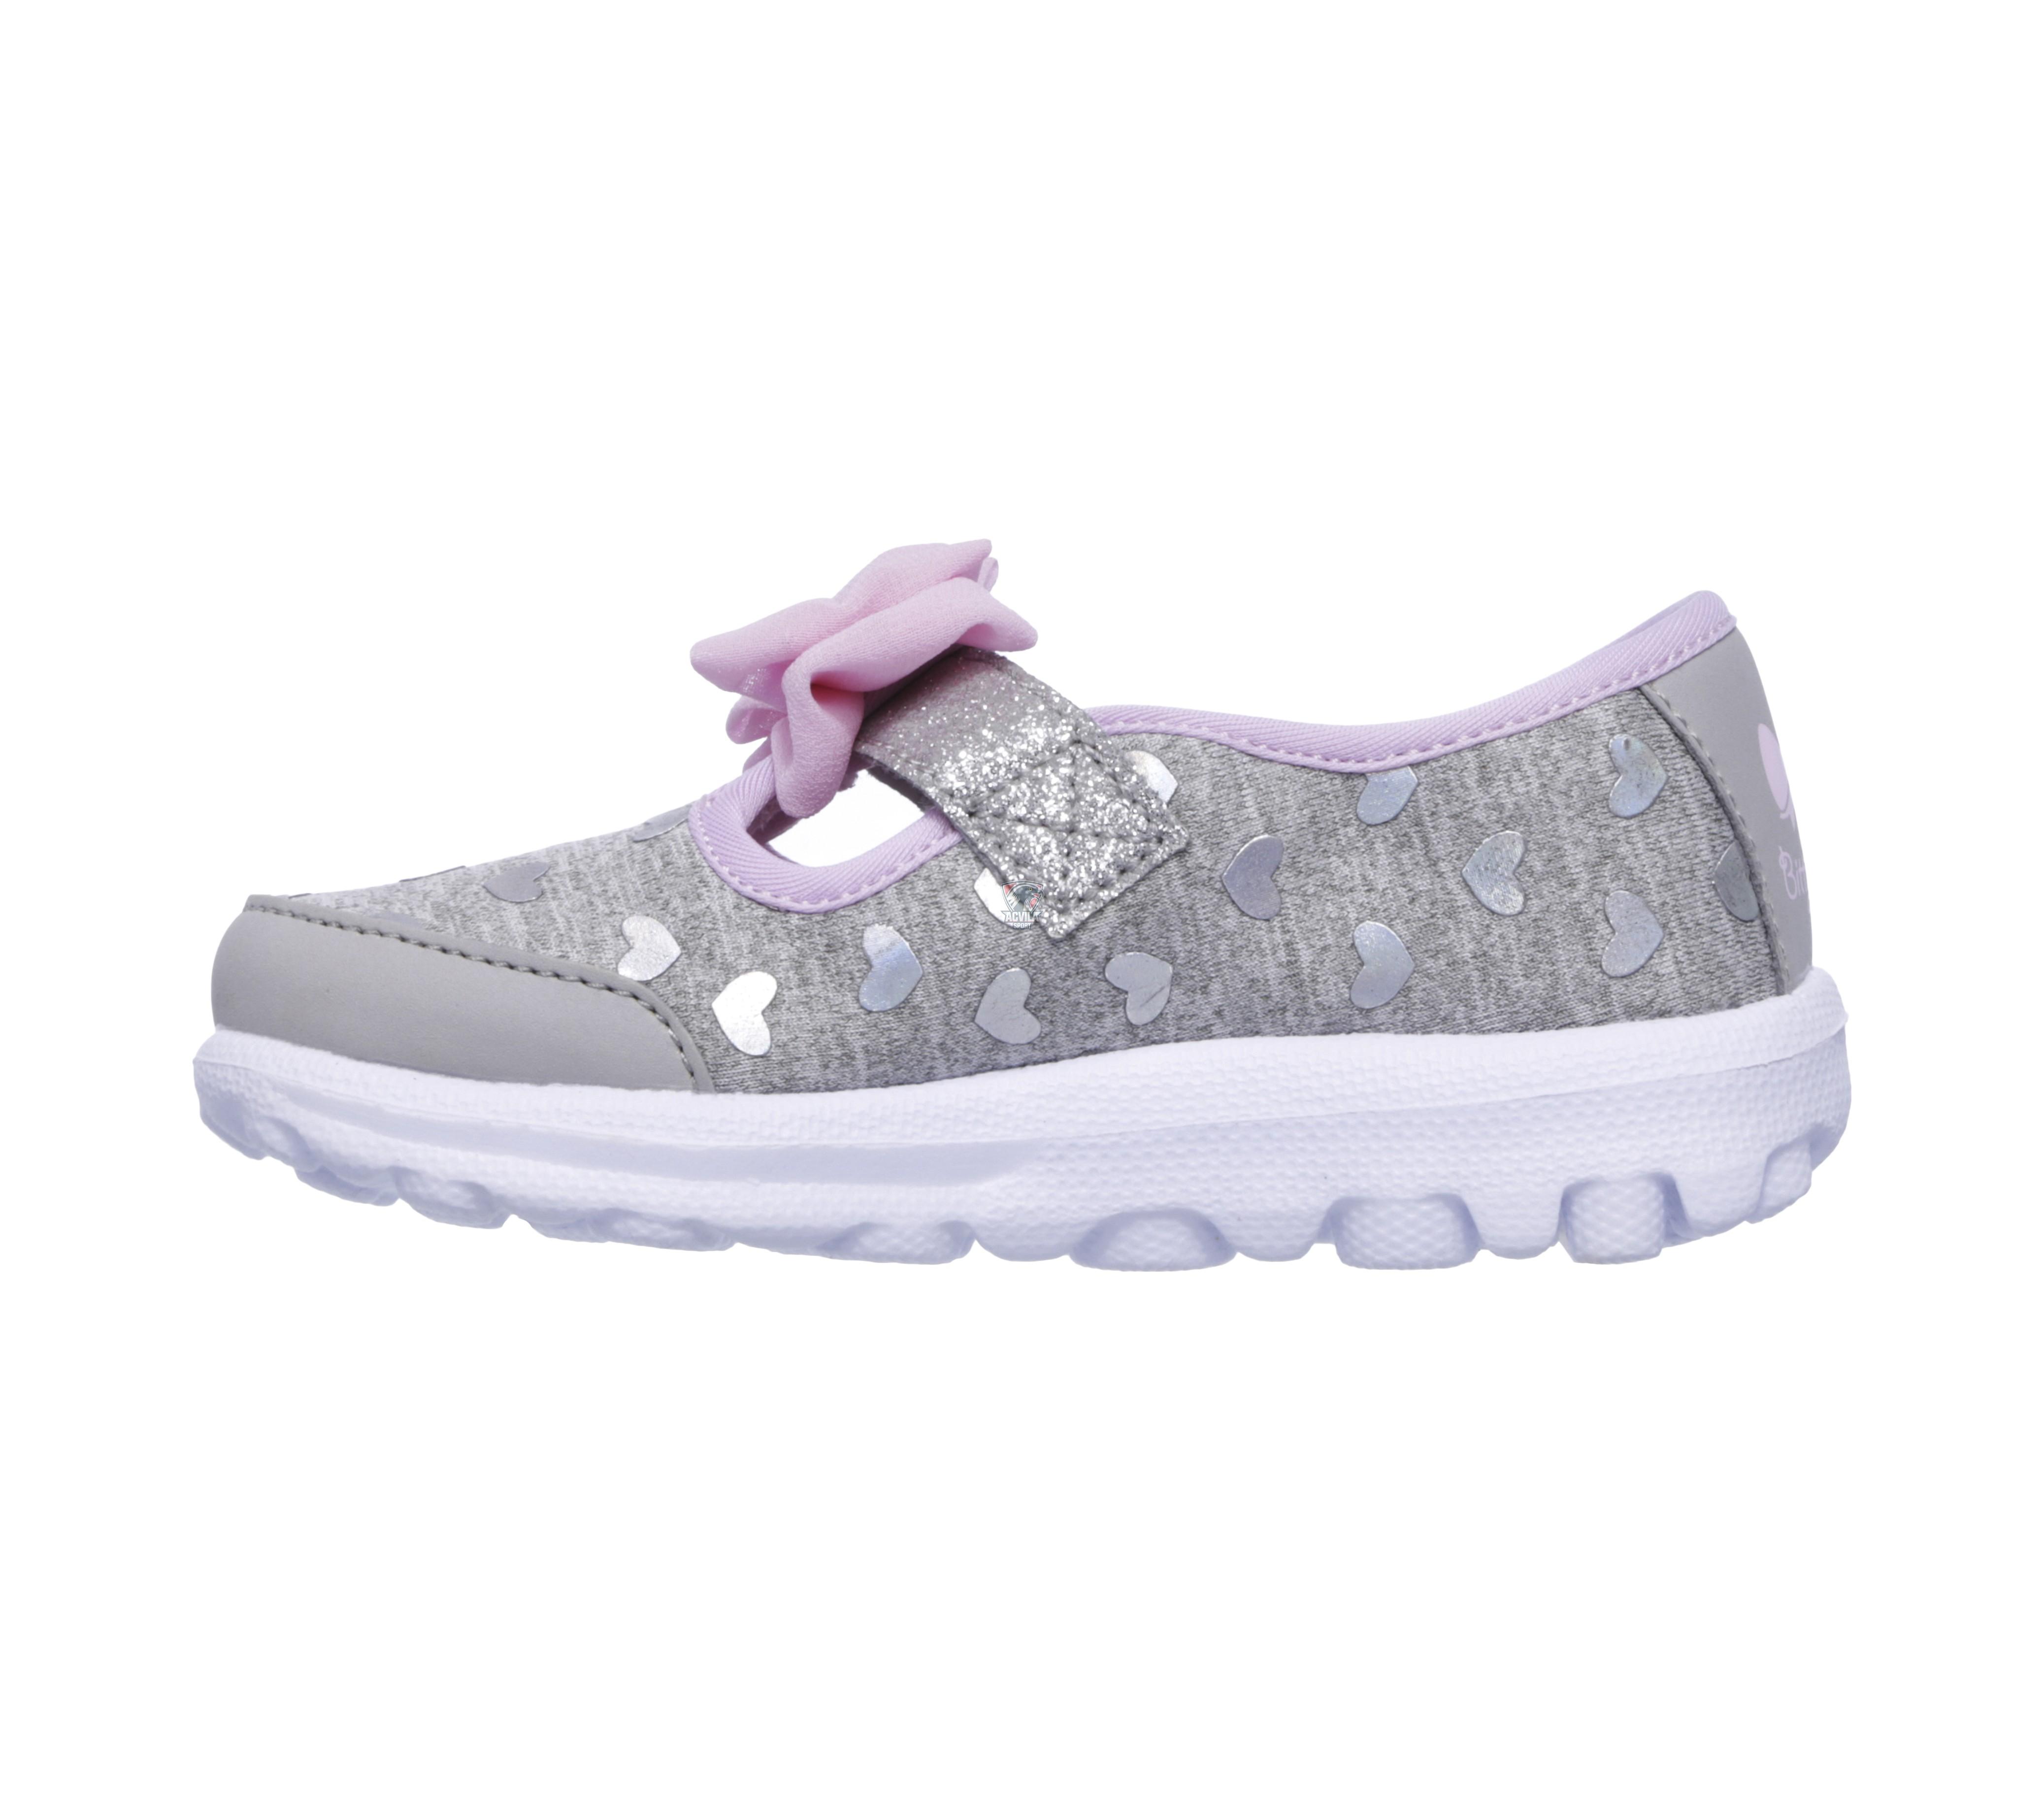 photo 10 Детская обувь SKECHERS DYNAMIGHT - LEAD RUNNER